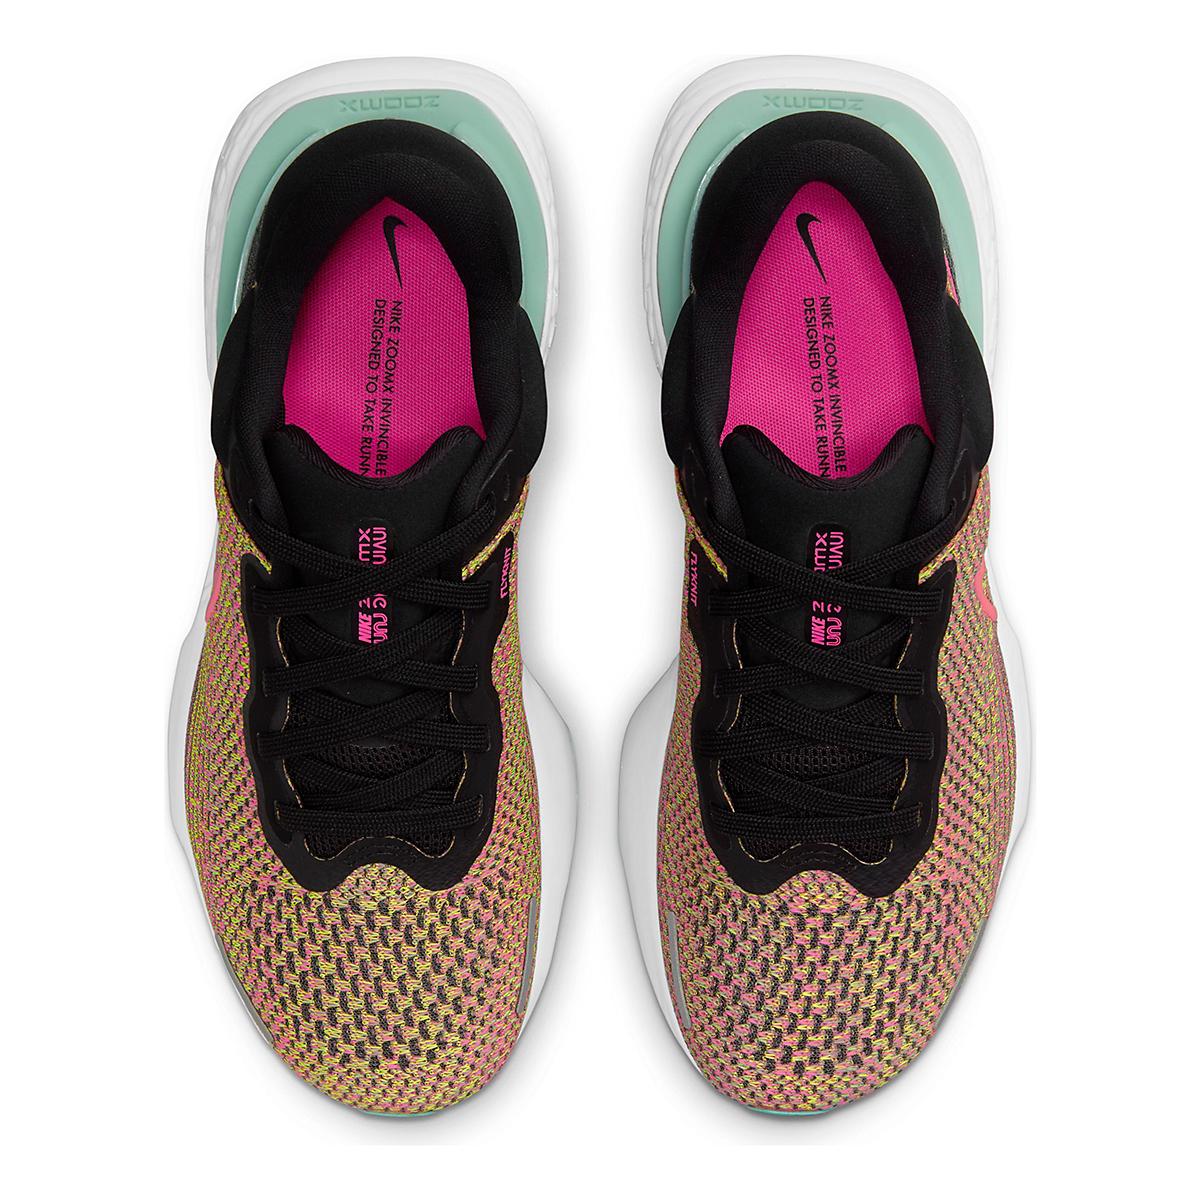 Women's Nike Zoomx Invincible Run FlyKnit Running Shoe - Color: Volt/Bright Mango/Black/Light Dew - Size: 5 - Width: Regular, Volt/Bright Mango/Black/Light Dew, large, image 4